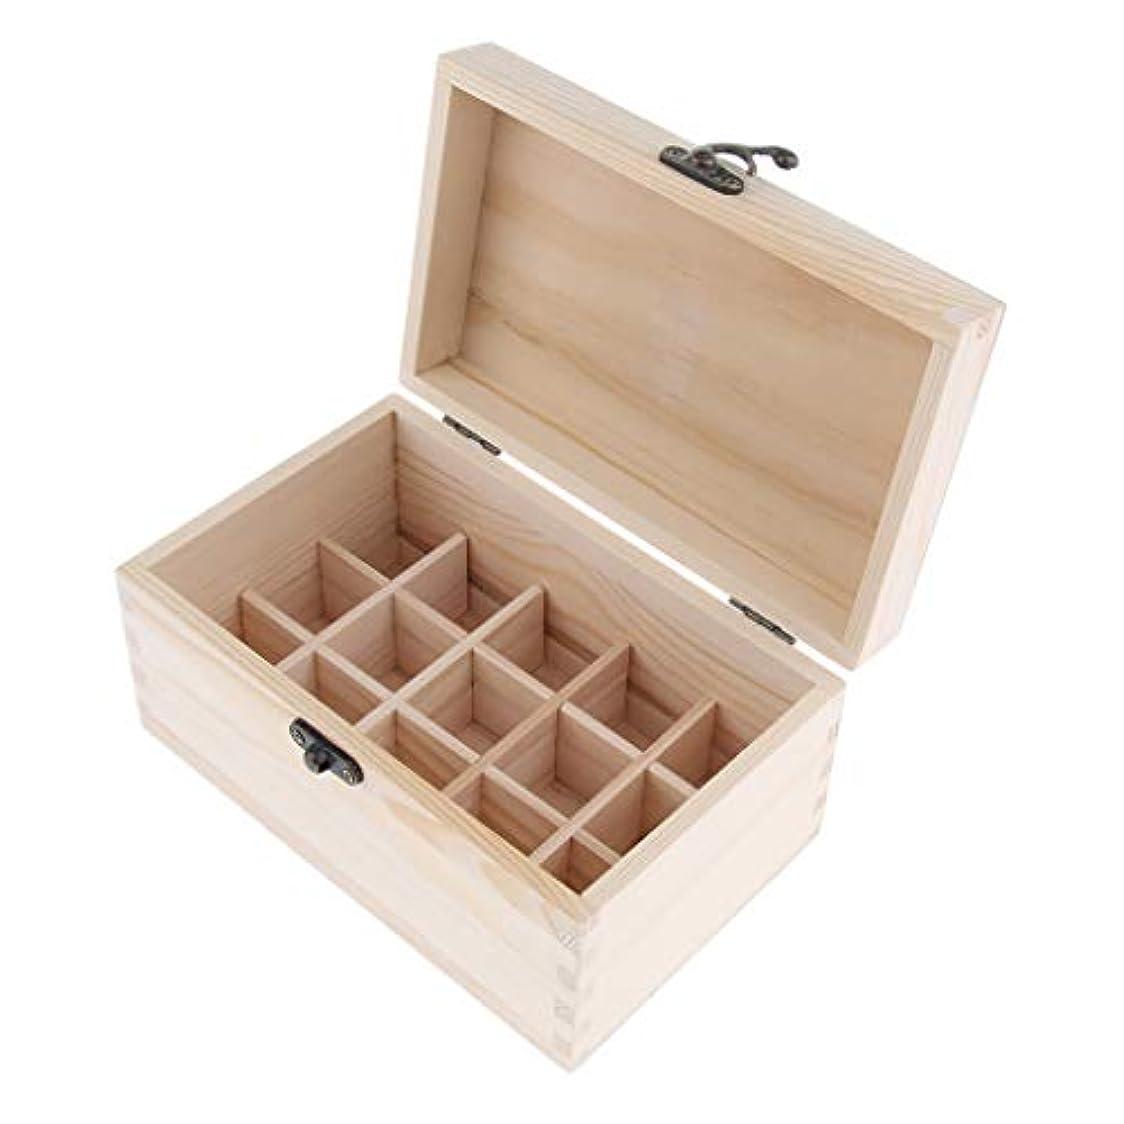 dailymall エッセンシャルオイル収納ボックス 木製 アロマケース 精油 香水収納 レトロ 大容量 15本用